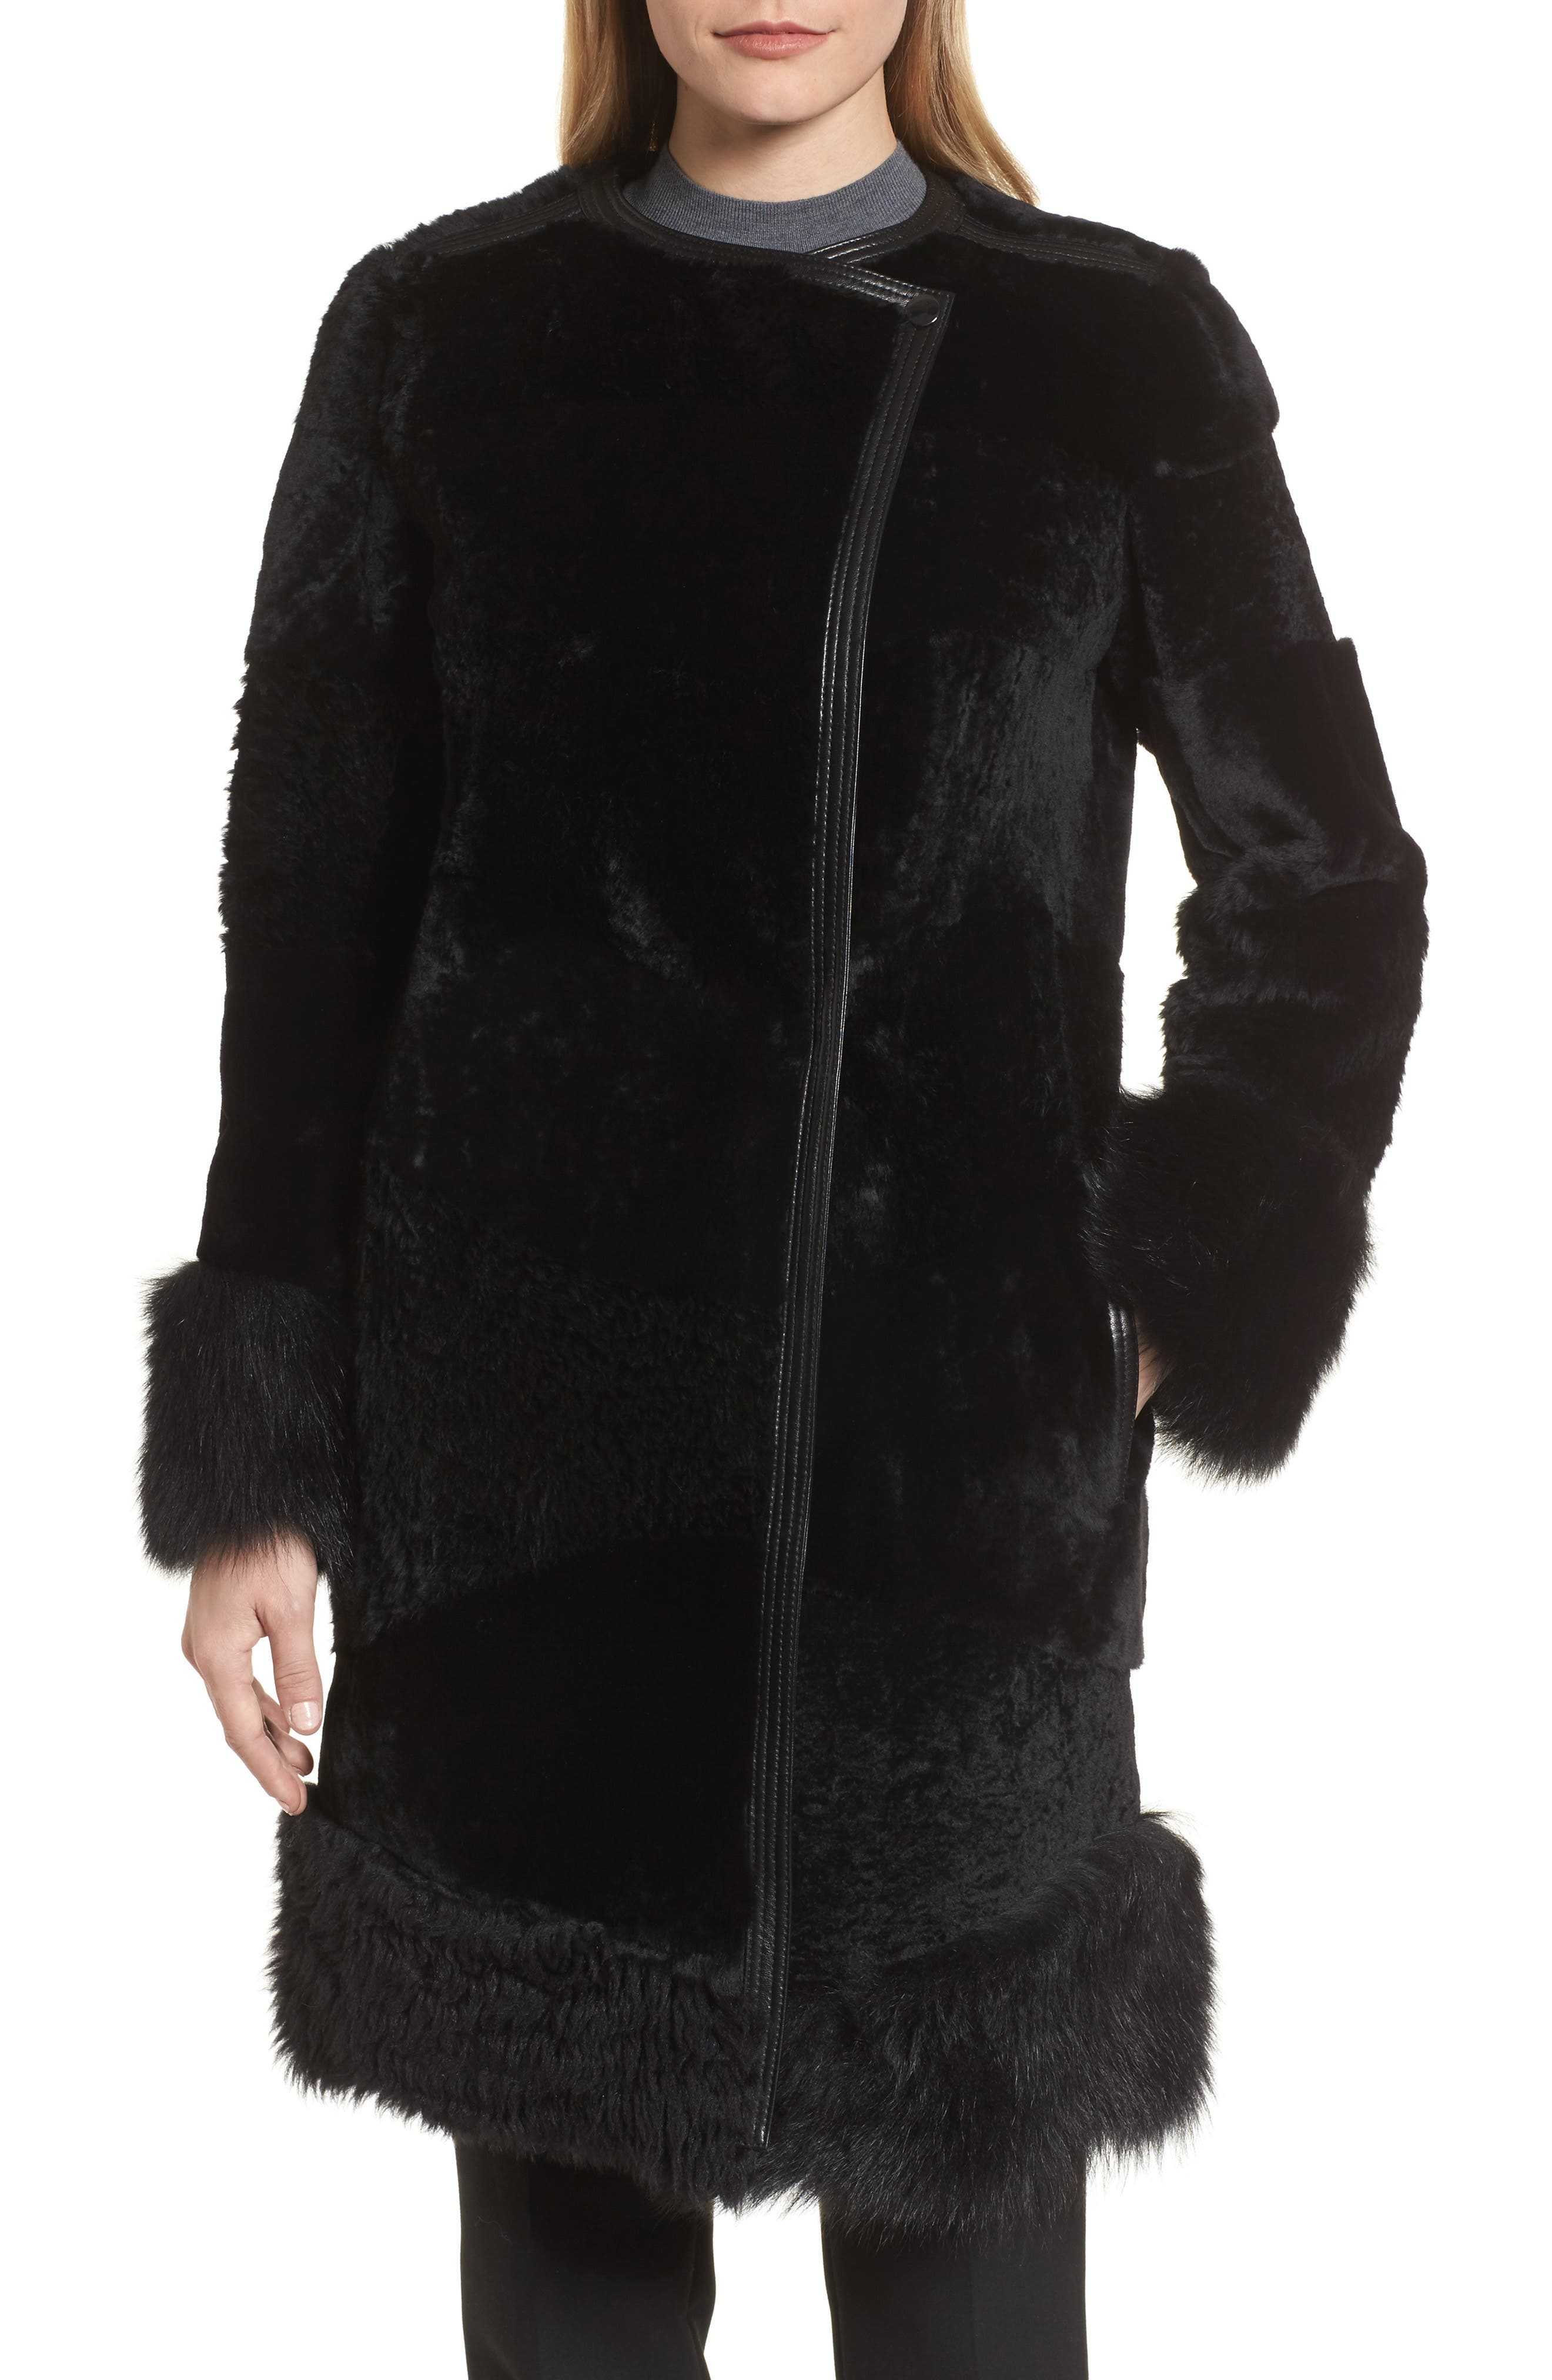 Alternate Image 1 Selected - BOSS Sopora Long Genuine Shearling & Leather Trim Jacket